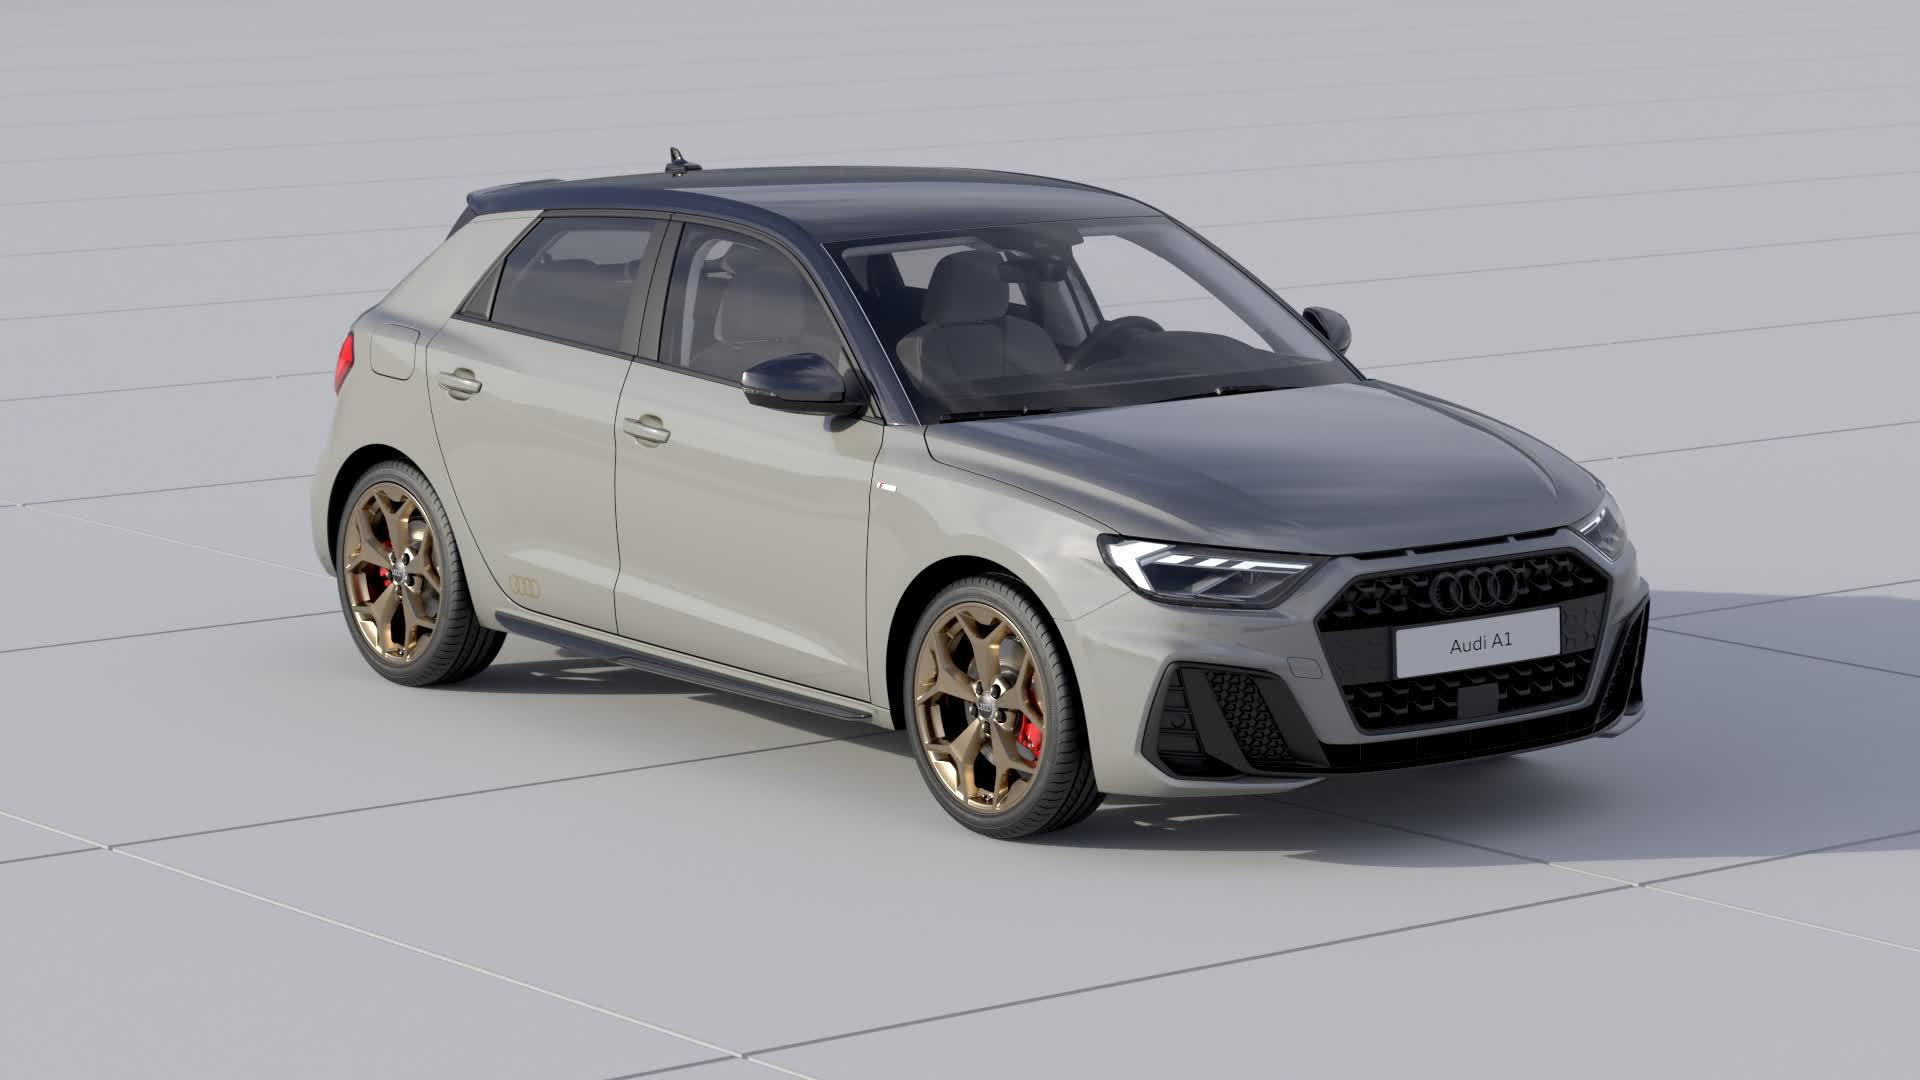 Audi A1 Sportback exterior design (Animation)